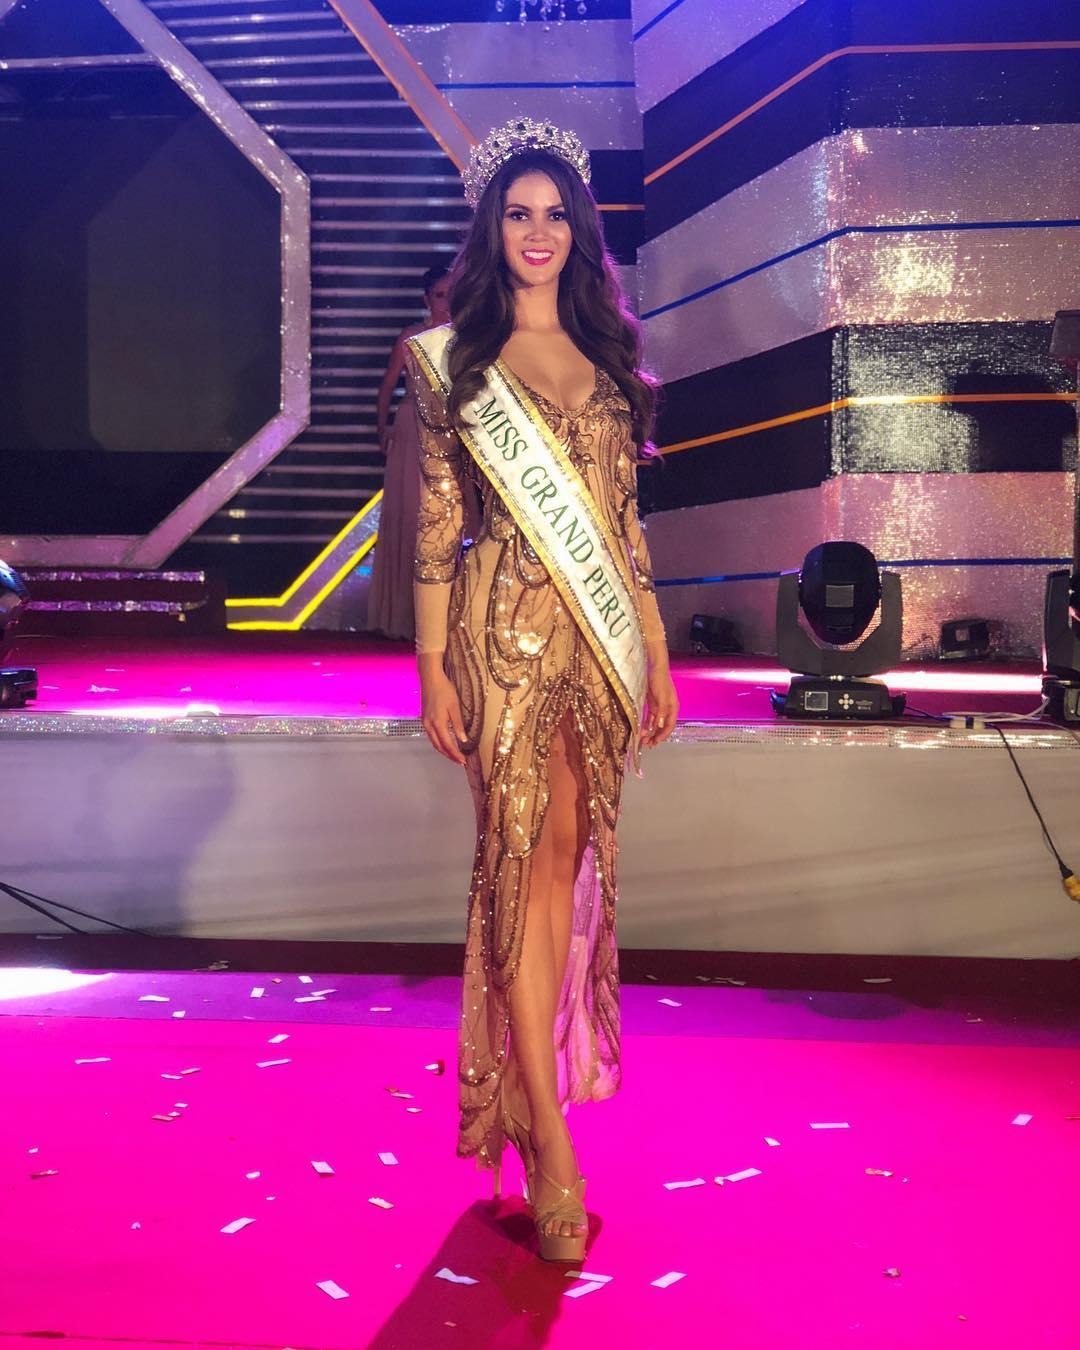 andrea moberg, top 20 de miss grand international 2018 (best national costume). - Página 2 38535610